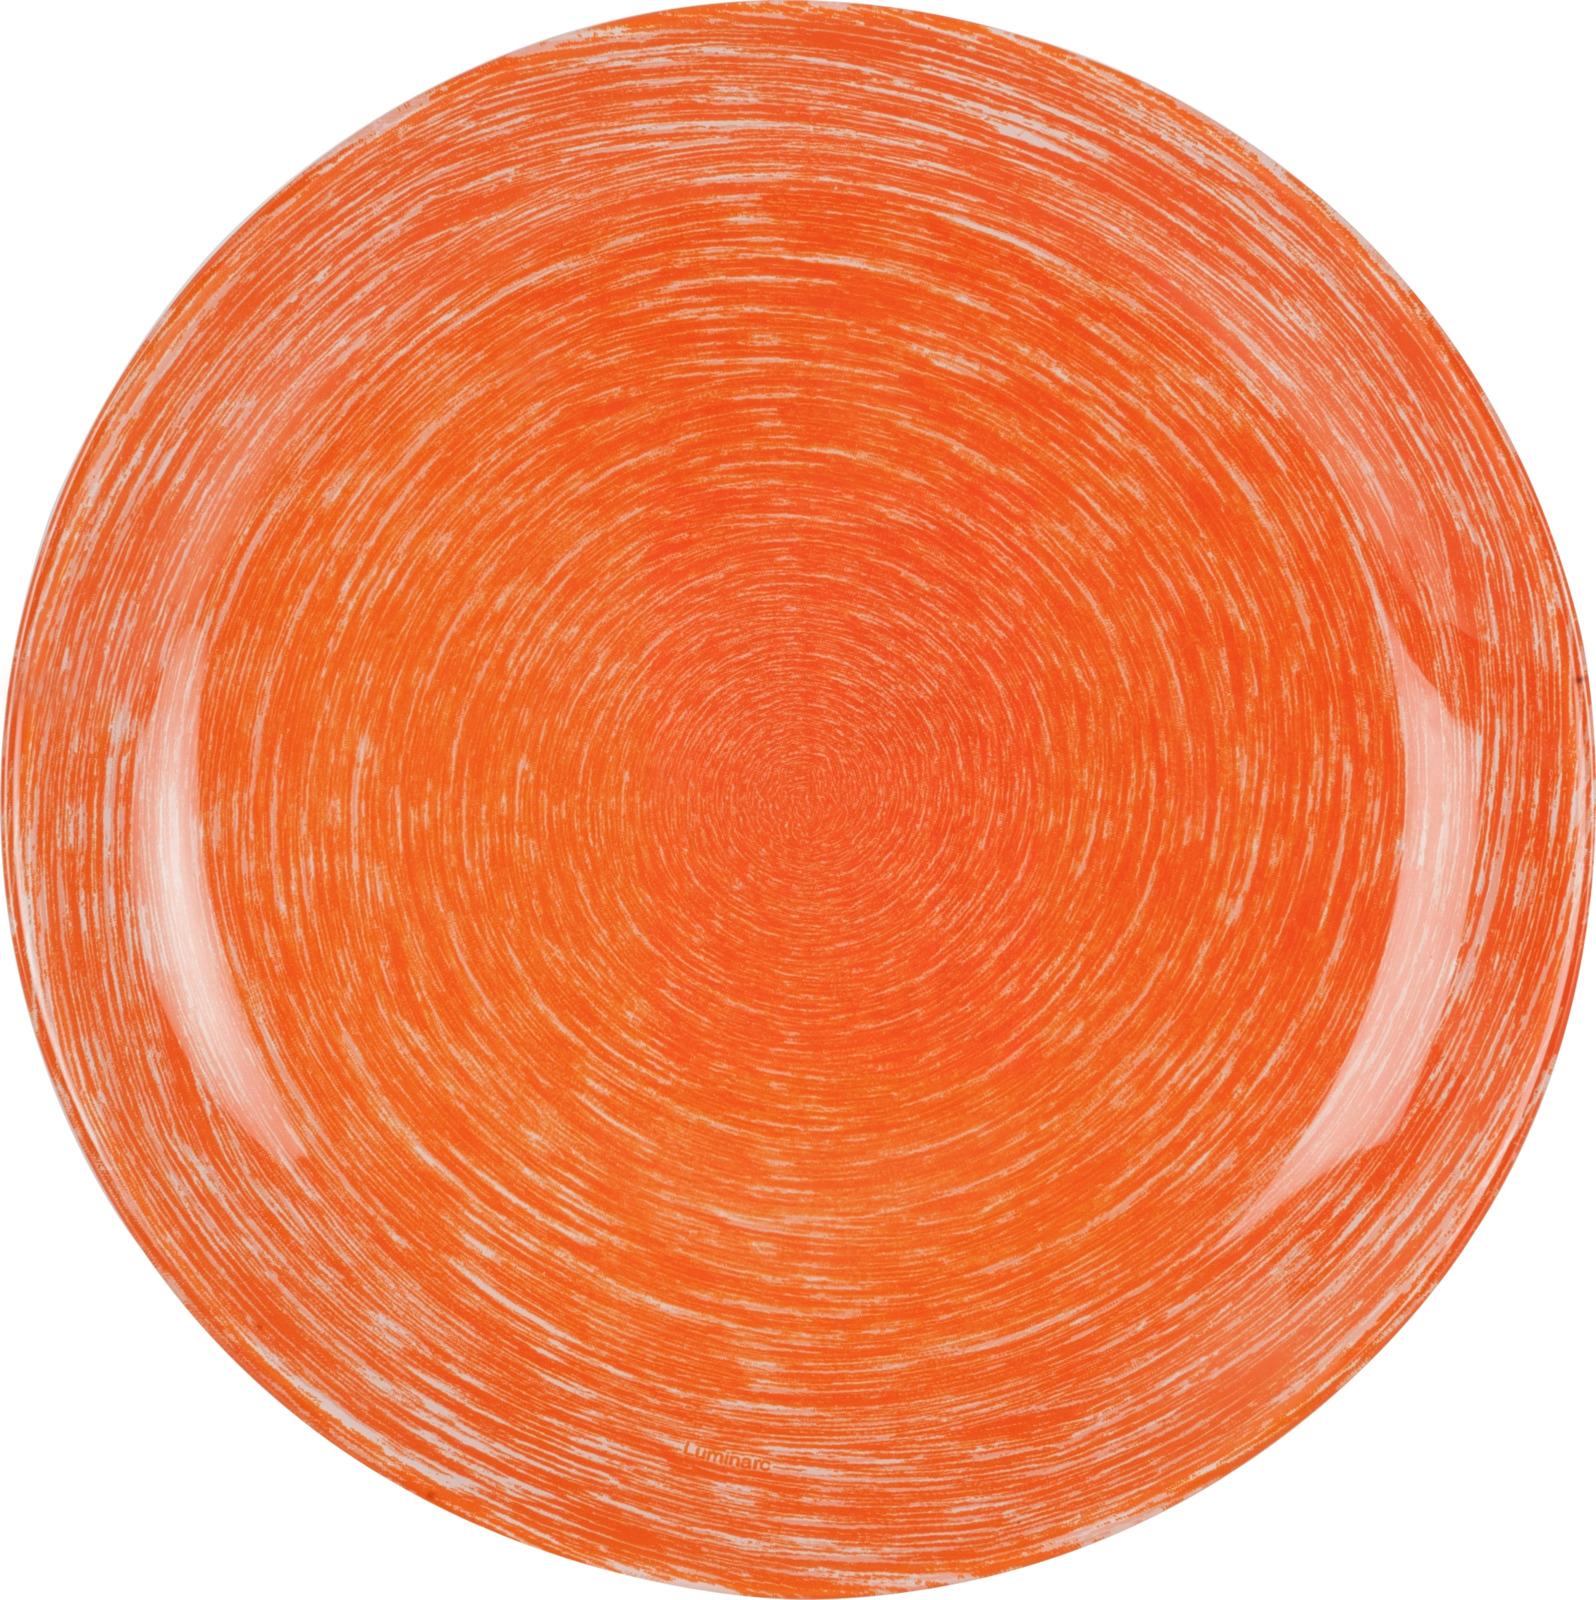 Тарелка десертная Luminarc Брашмания, P1381, оранжевый, диаметр 20.5 см